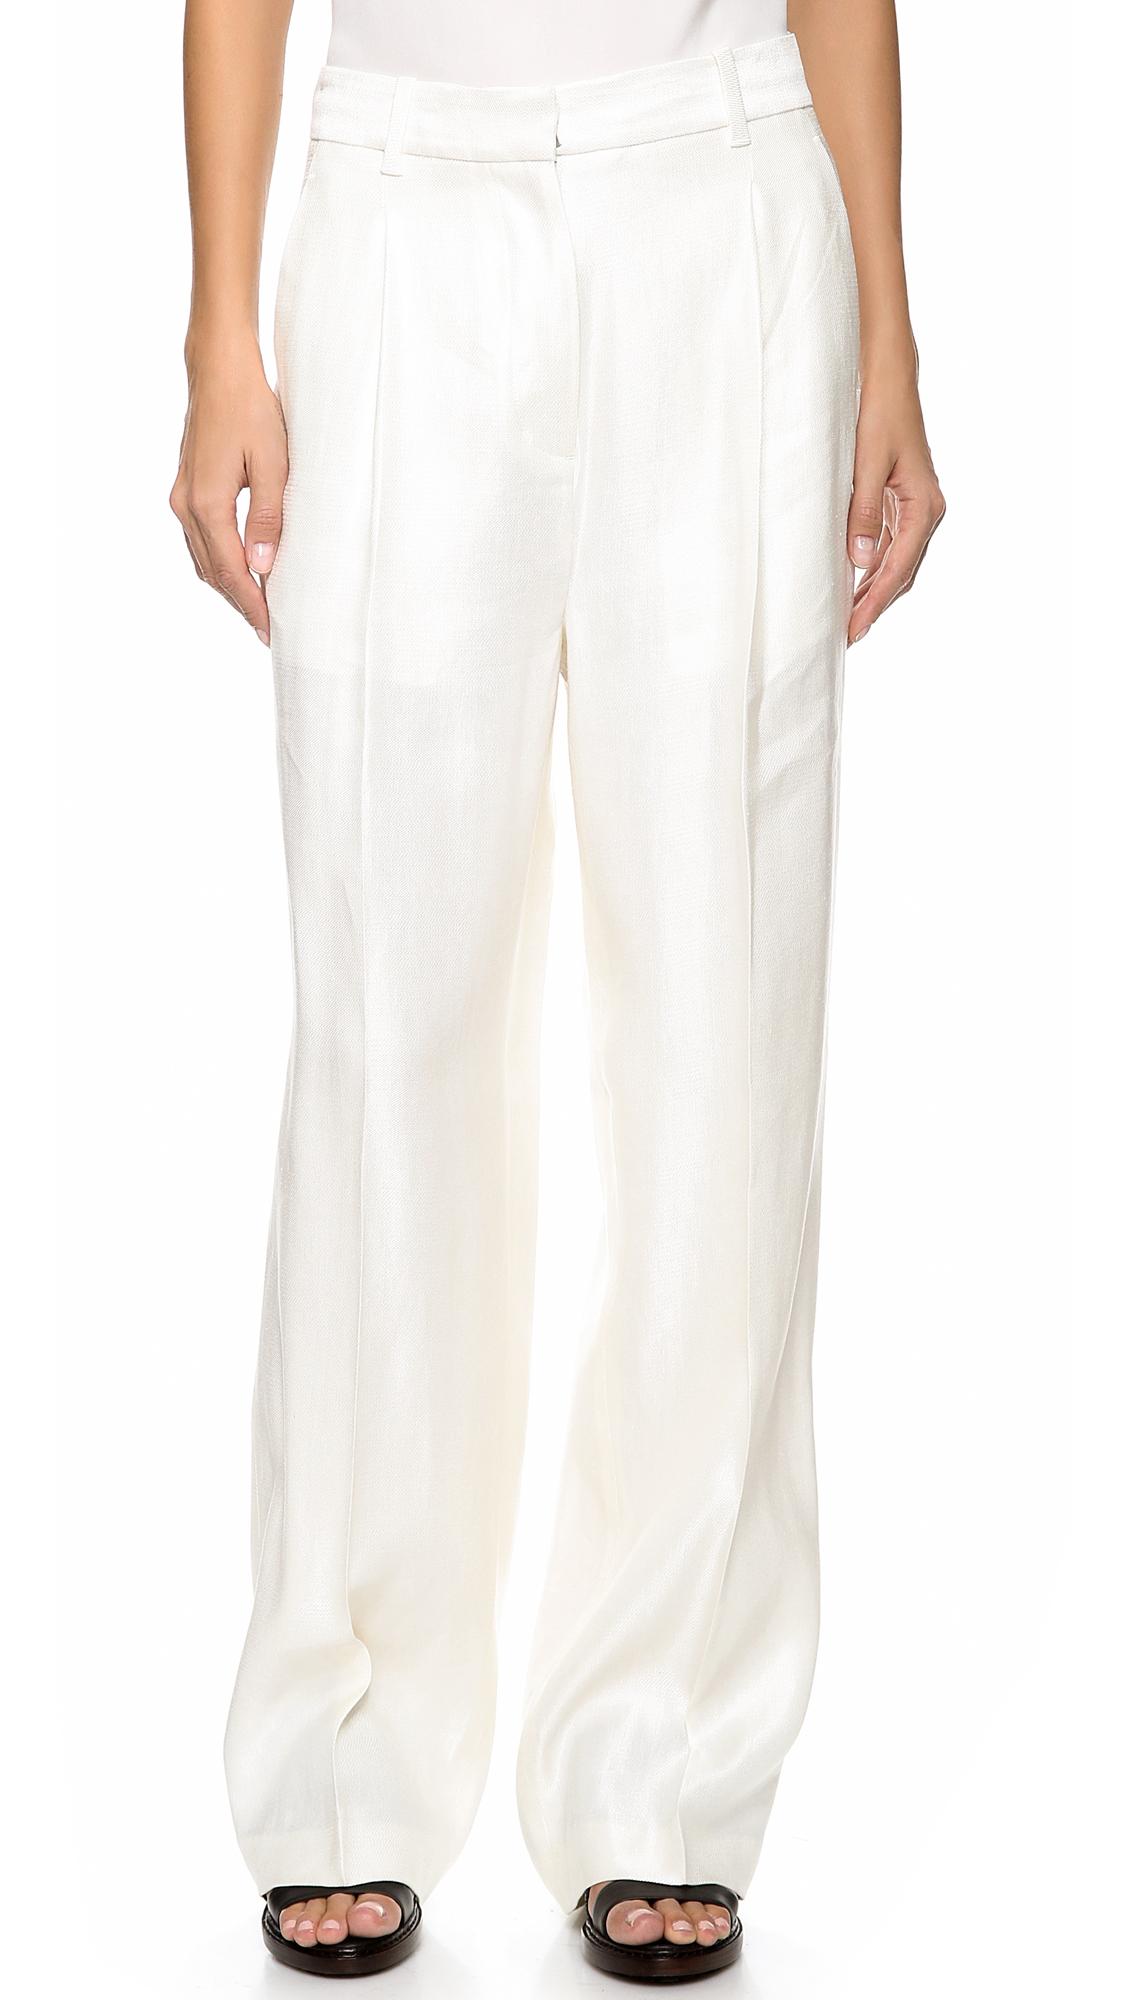 3 1 Phillip Lim High Waist Wide Leg Pants Cream In White